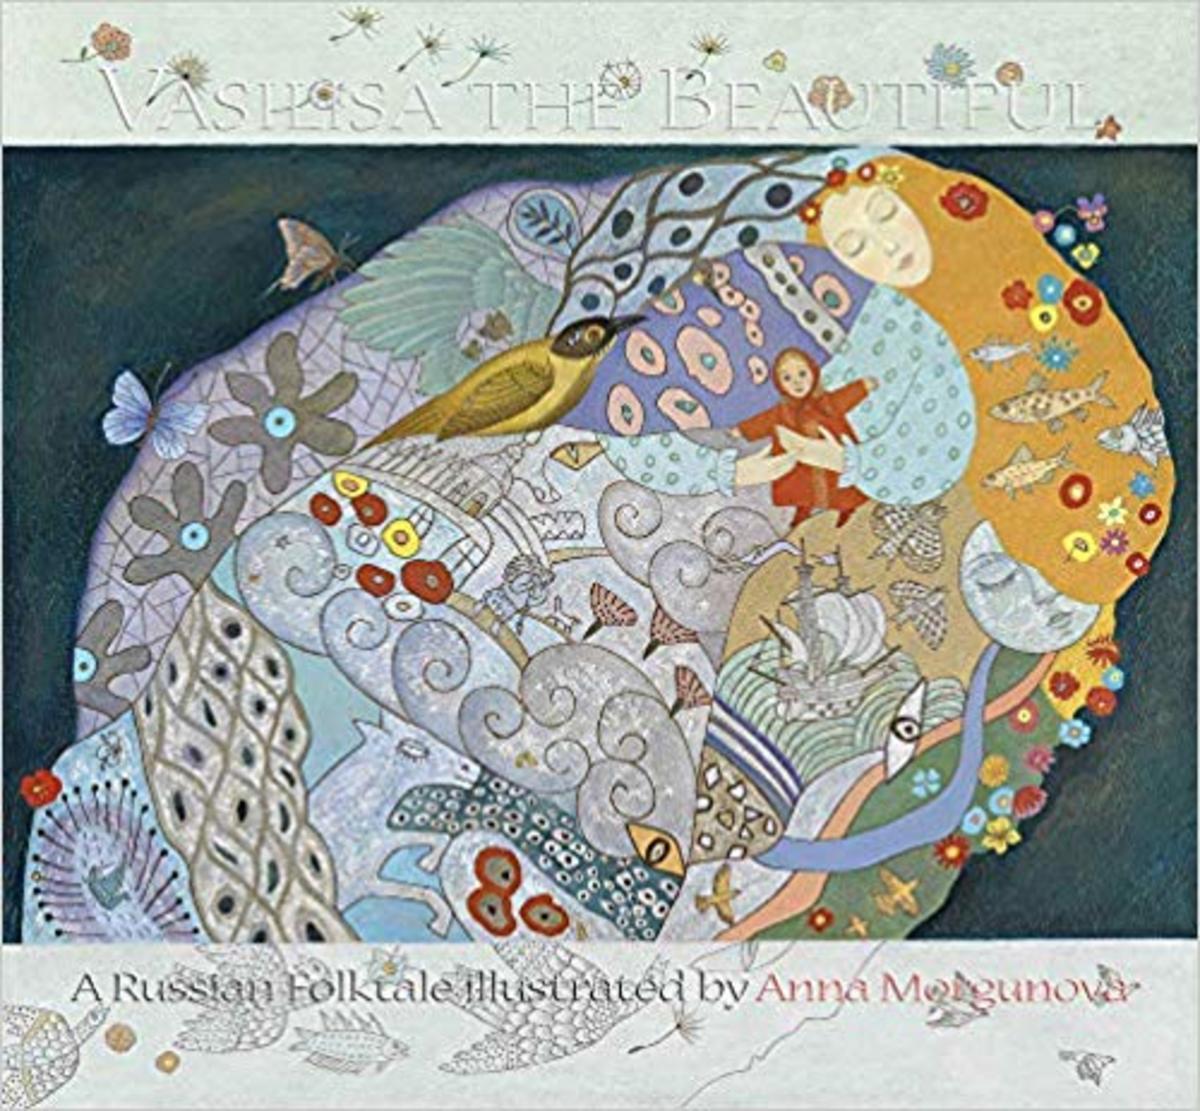 Vasilisa the Beautiful: A Russian Folktale by Anna Morgunova